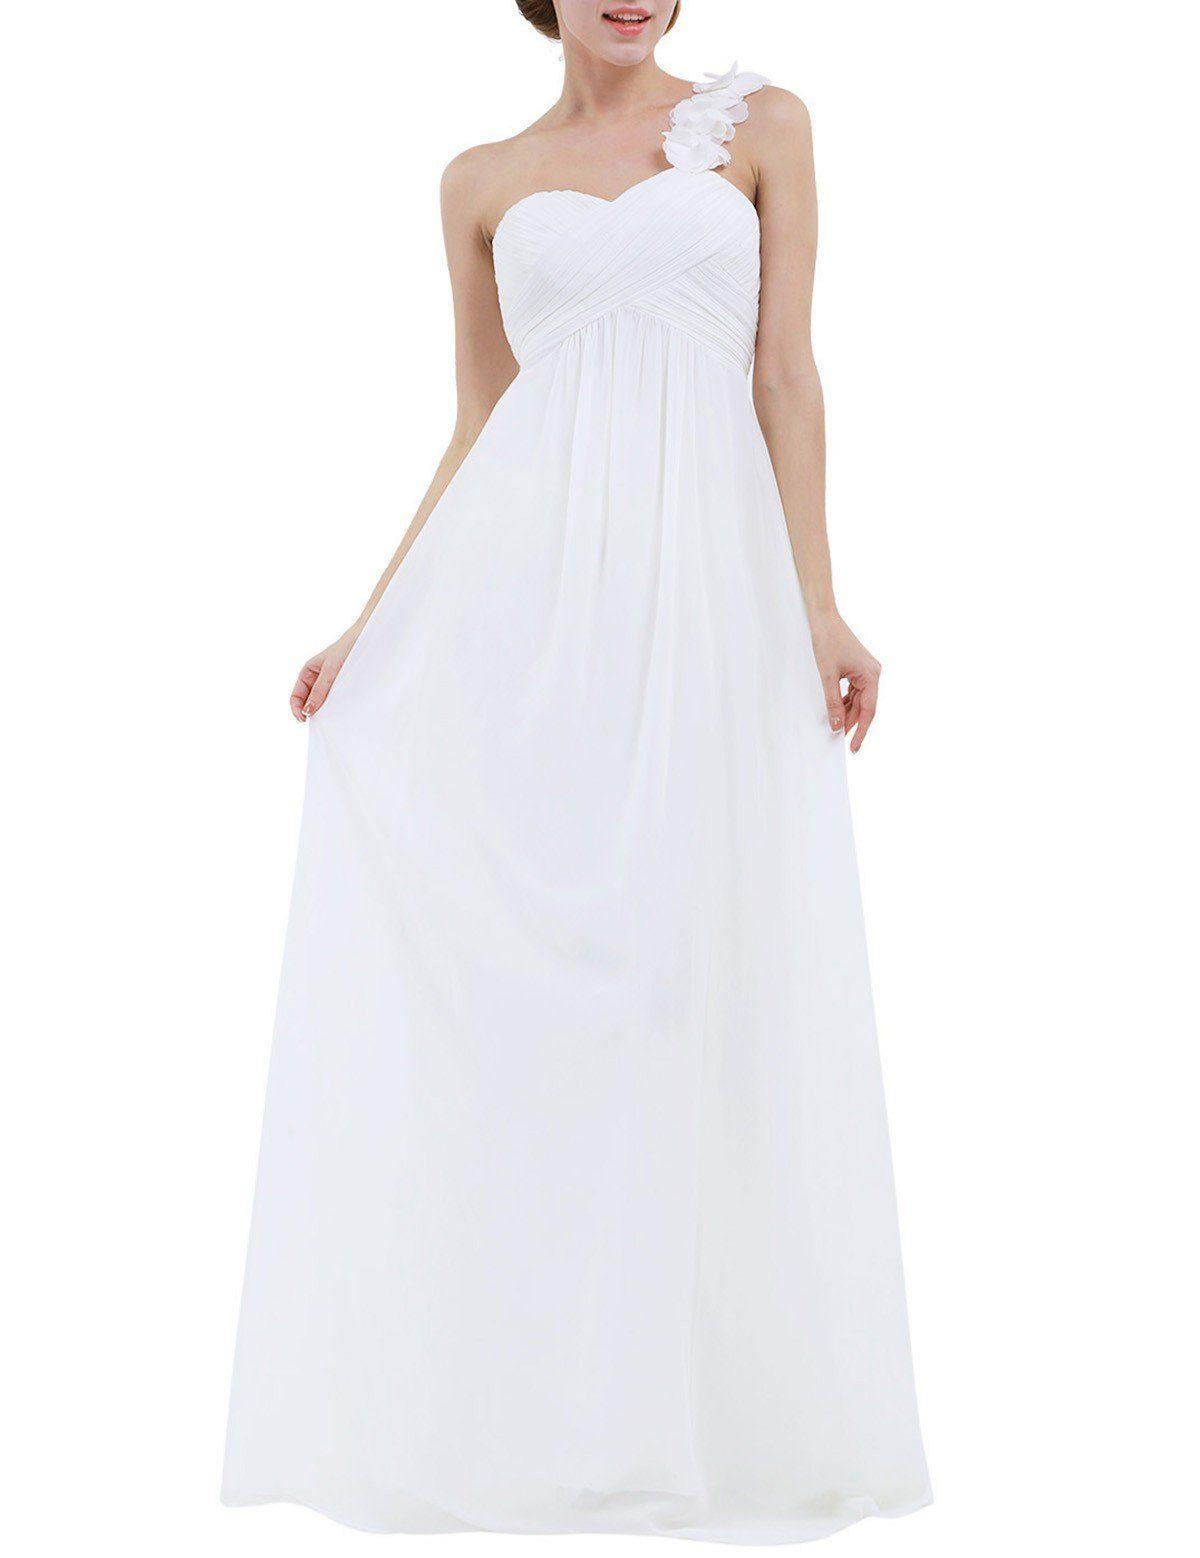 Iiniim womens chiffon oneshoulder evening prom gown wedding